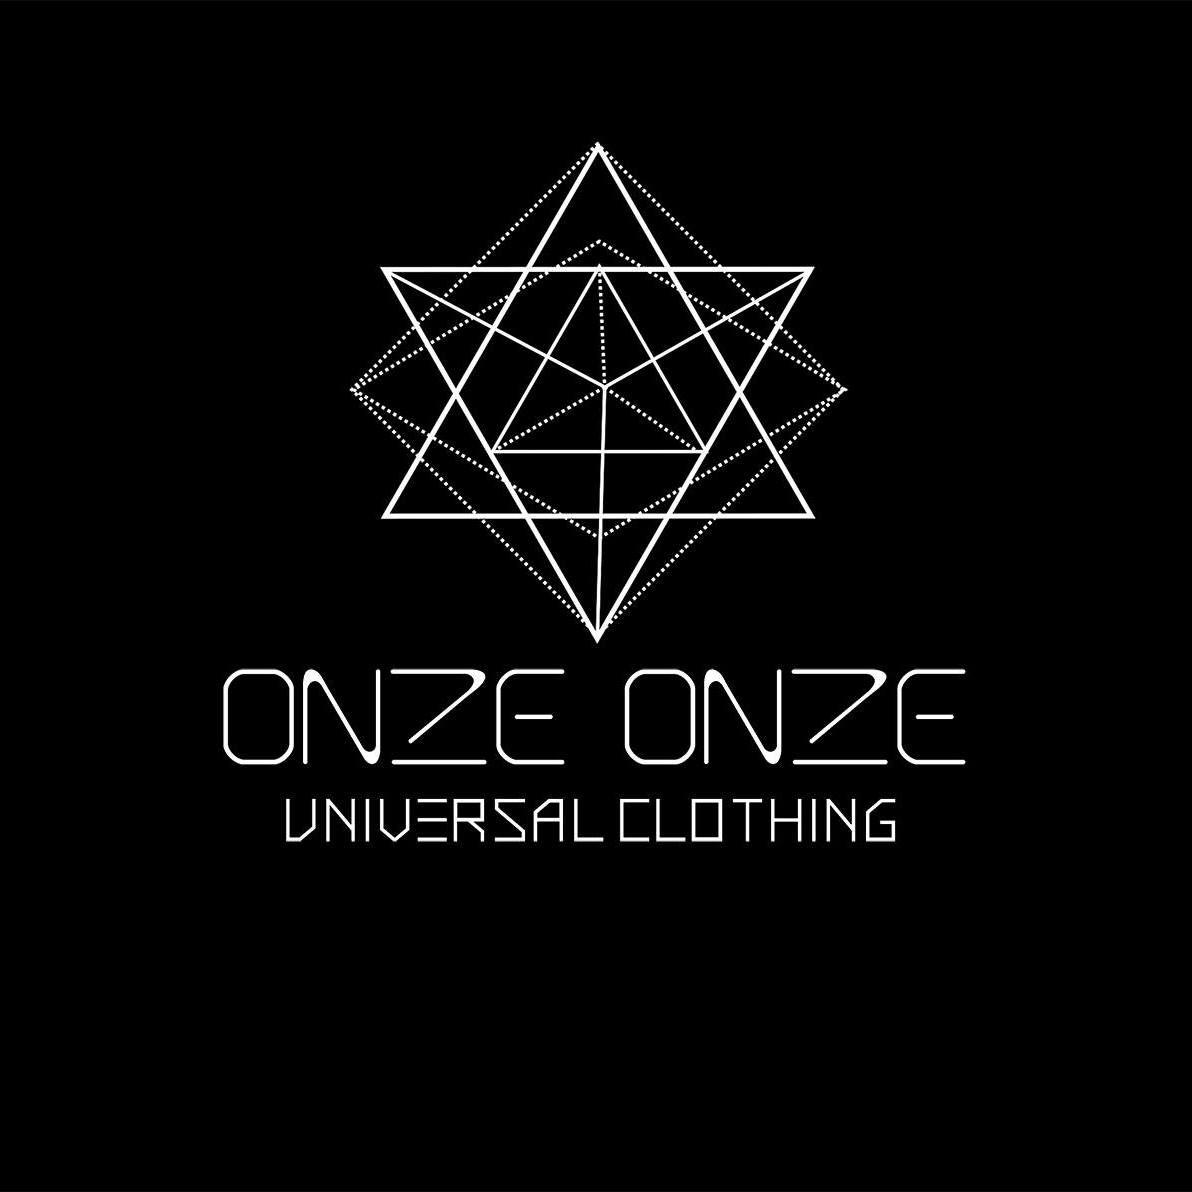 OnzeOnze Universal Clothing